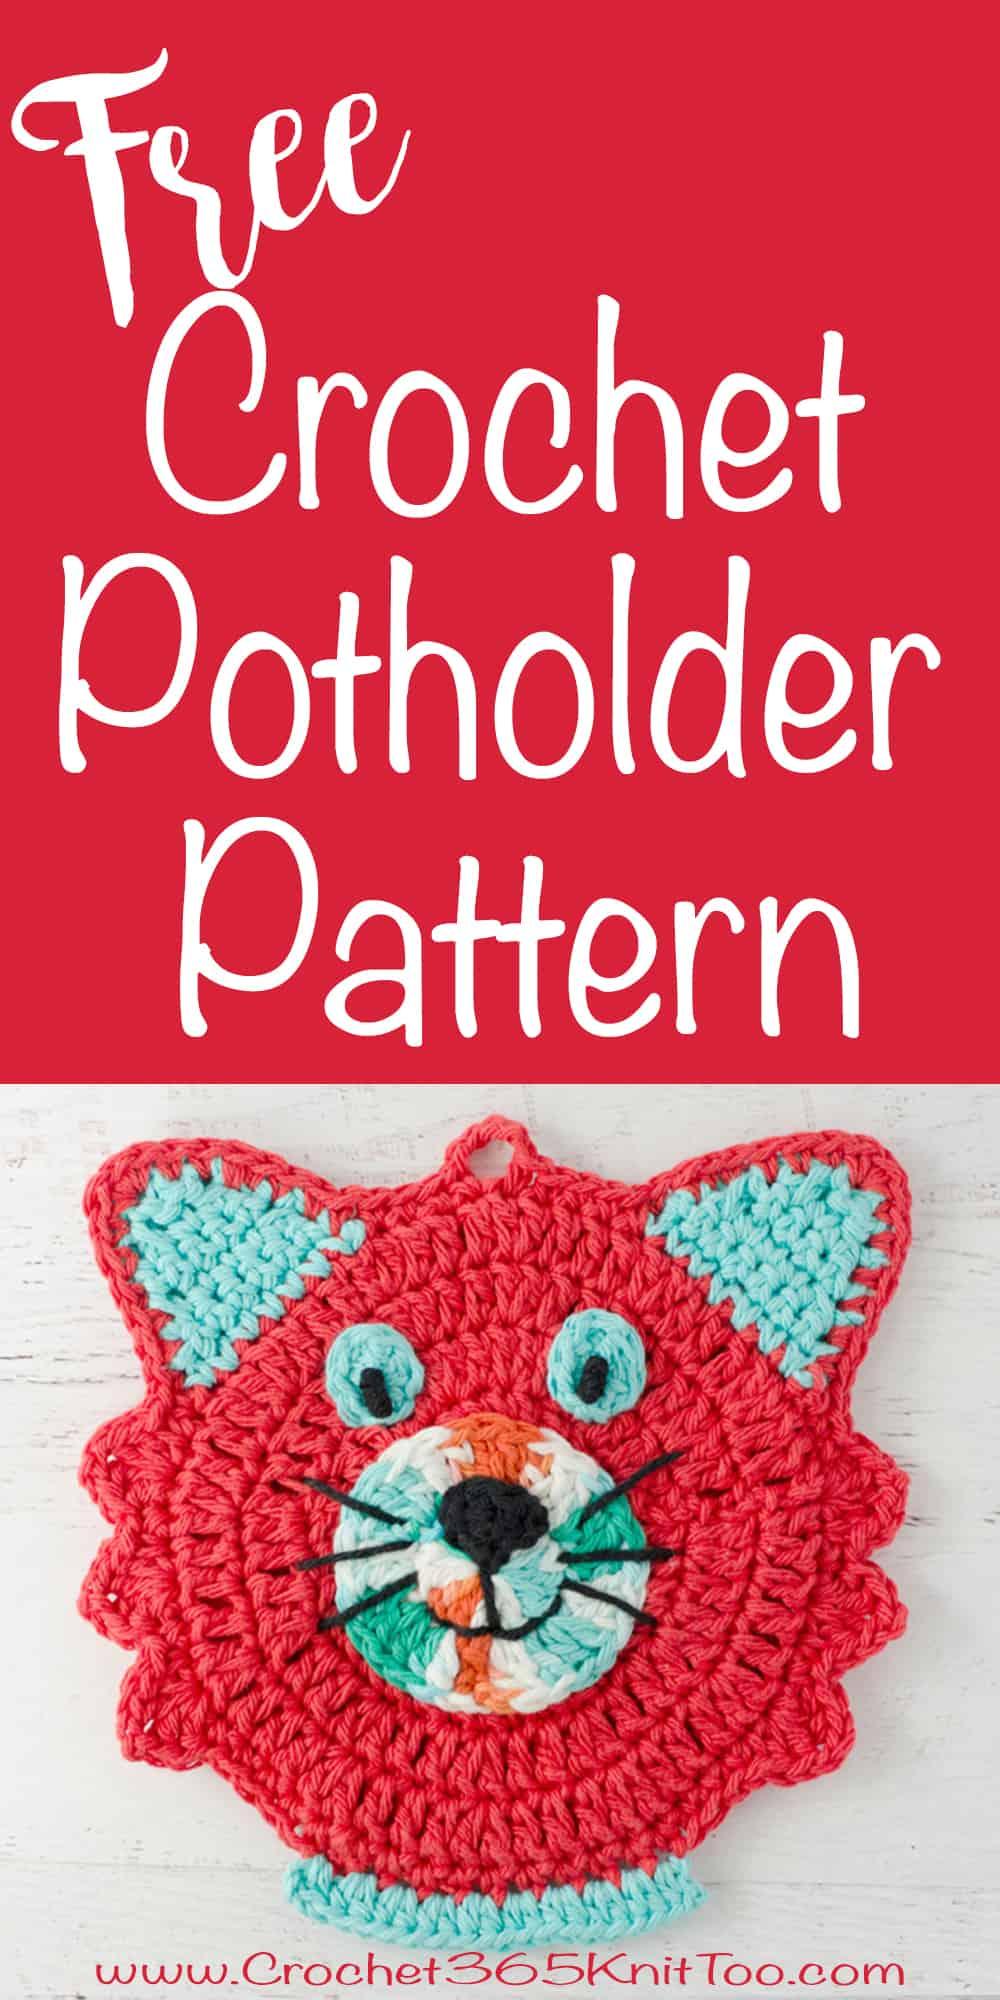 love this crochet cat potholder pattern |crochet365knittoo #crochetpatholder #crochetpattern